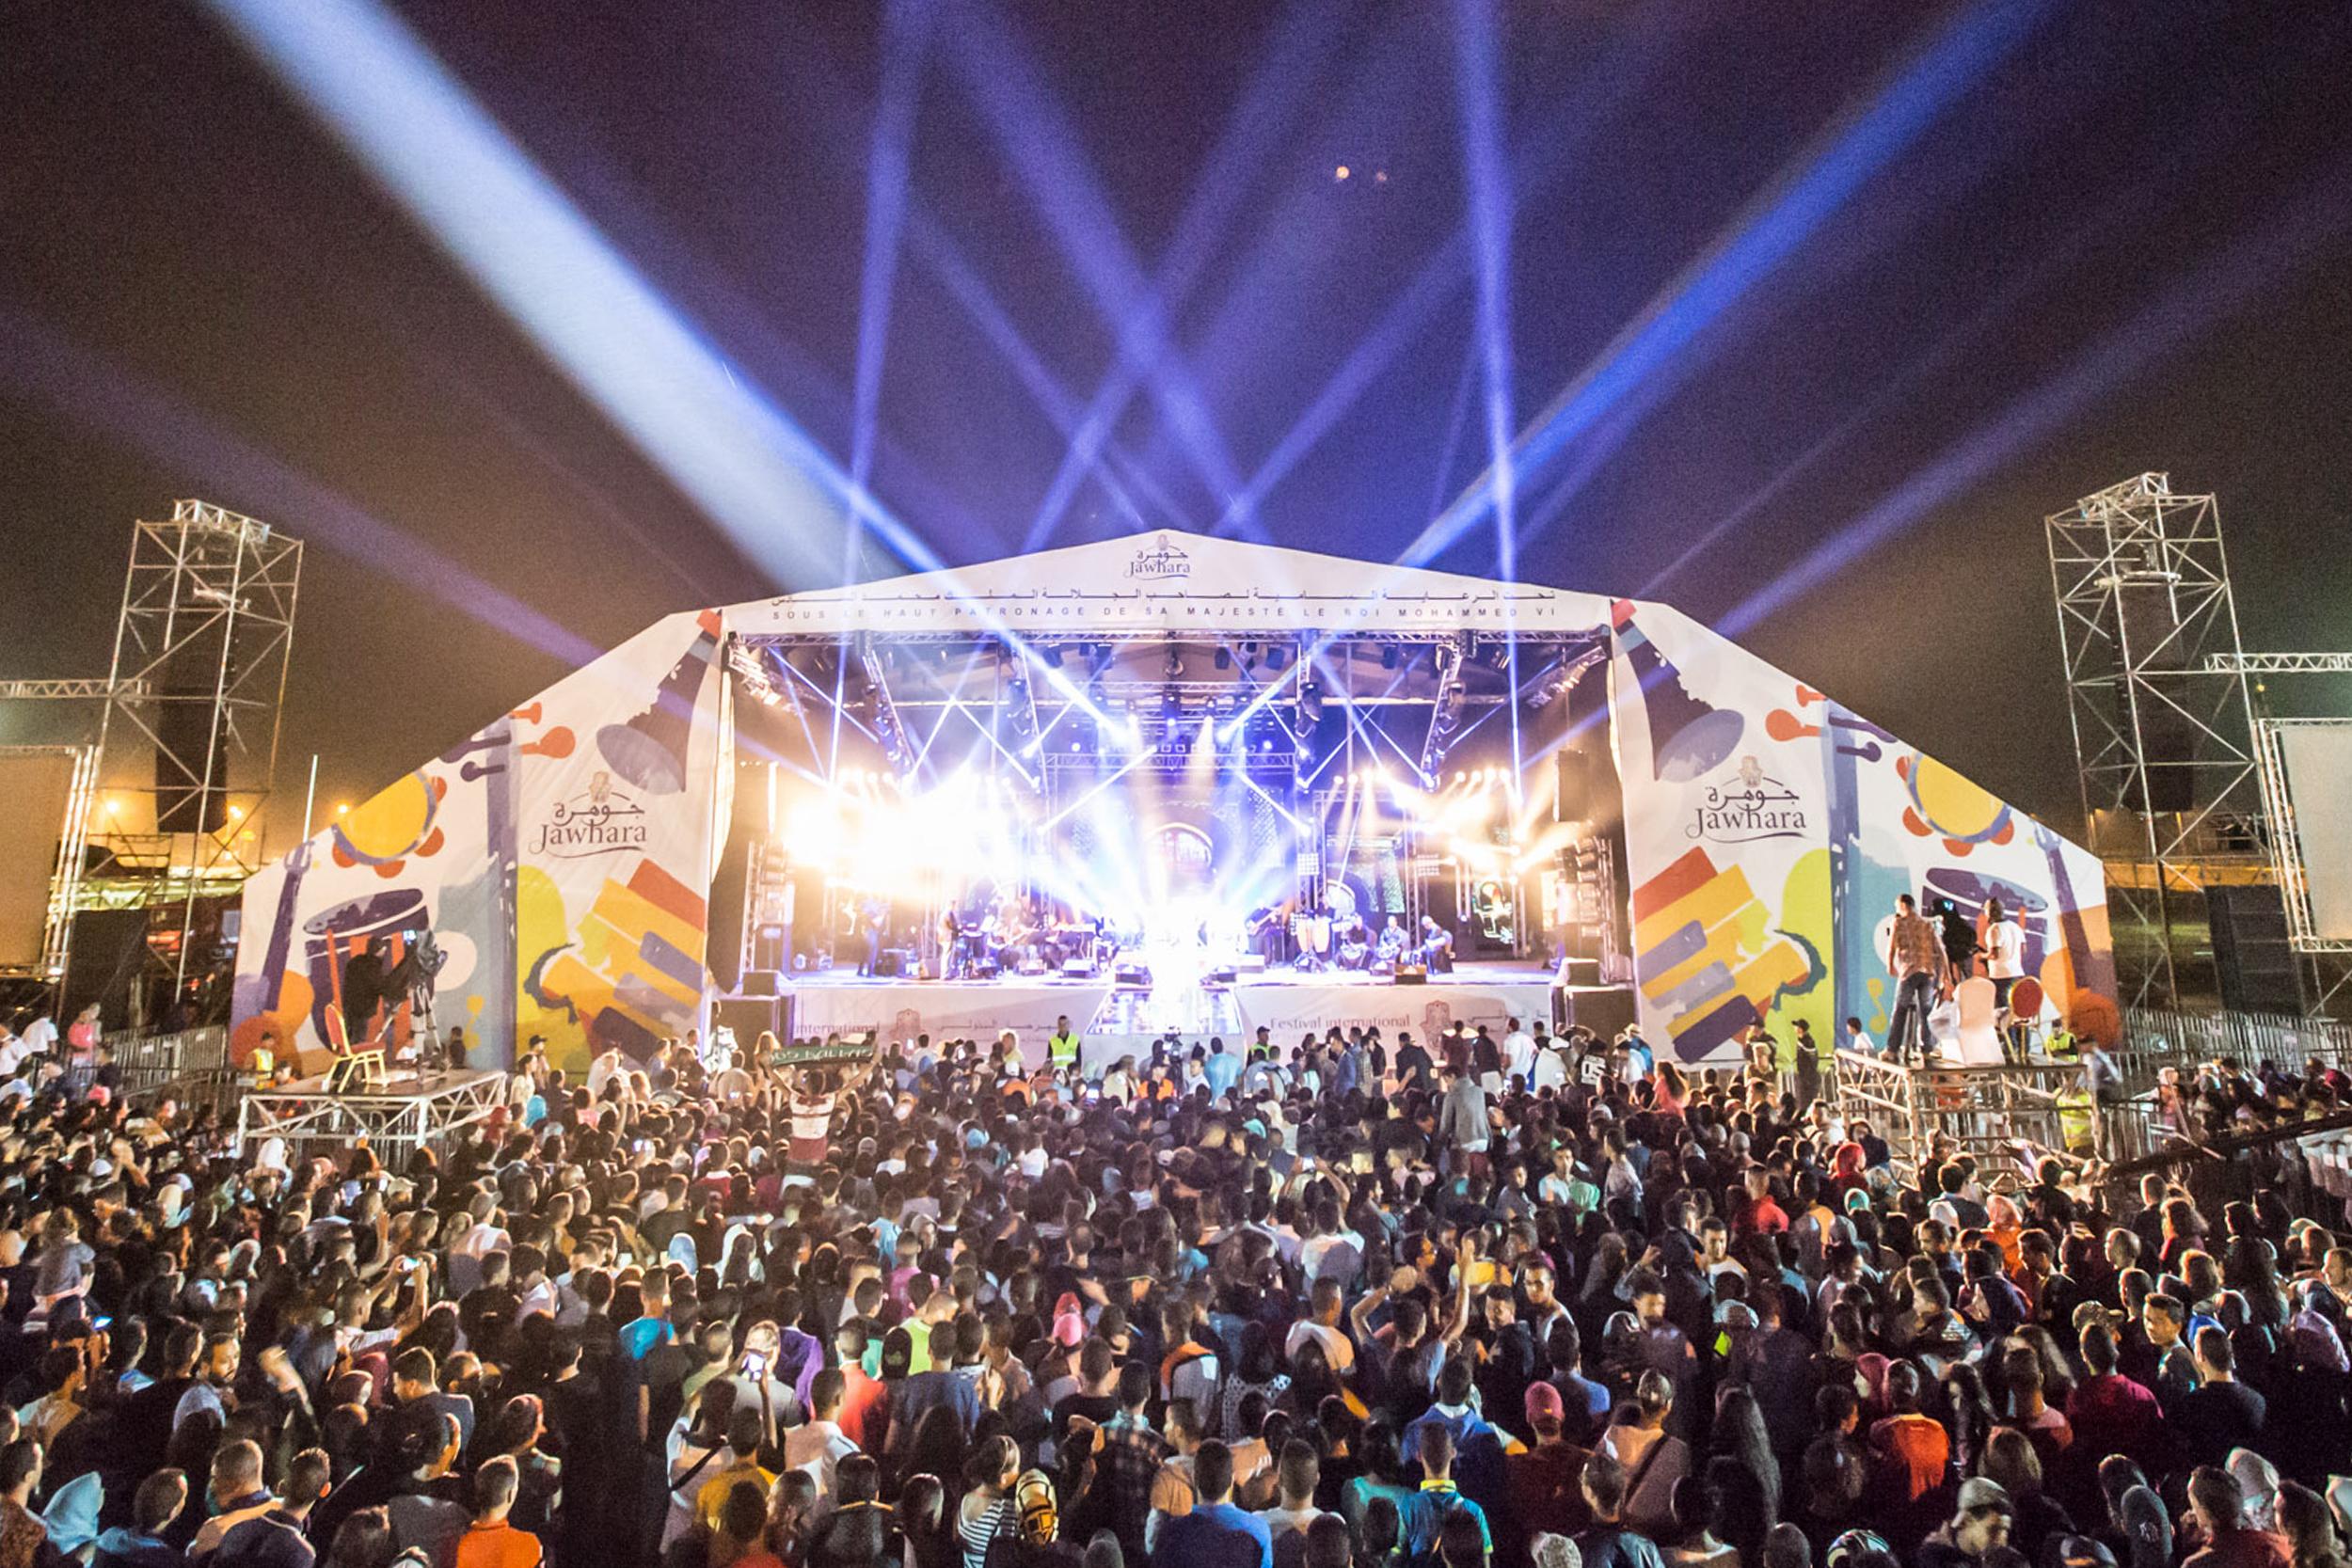 El Jadida fête  la septième  édition du  Festival  Jawahara